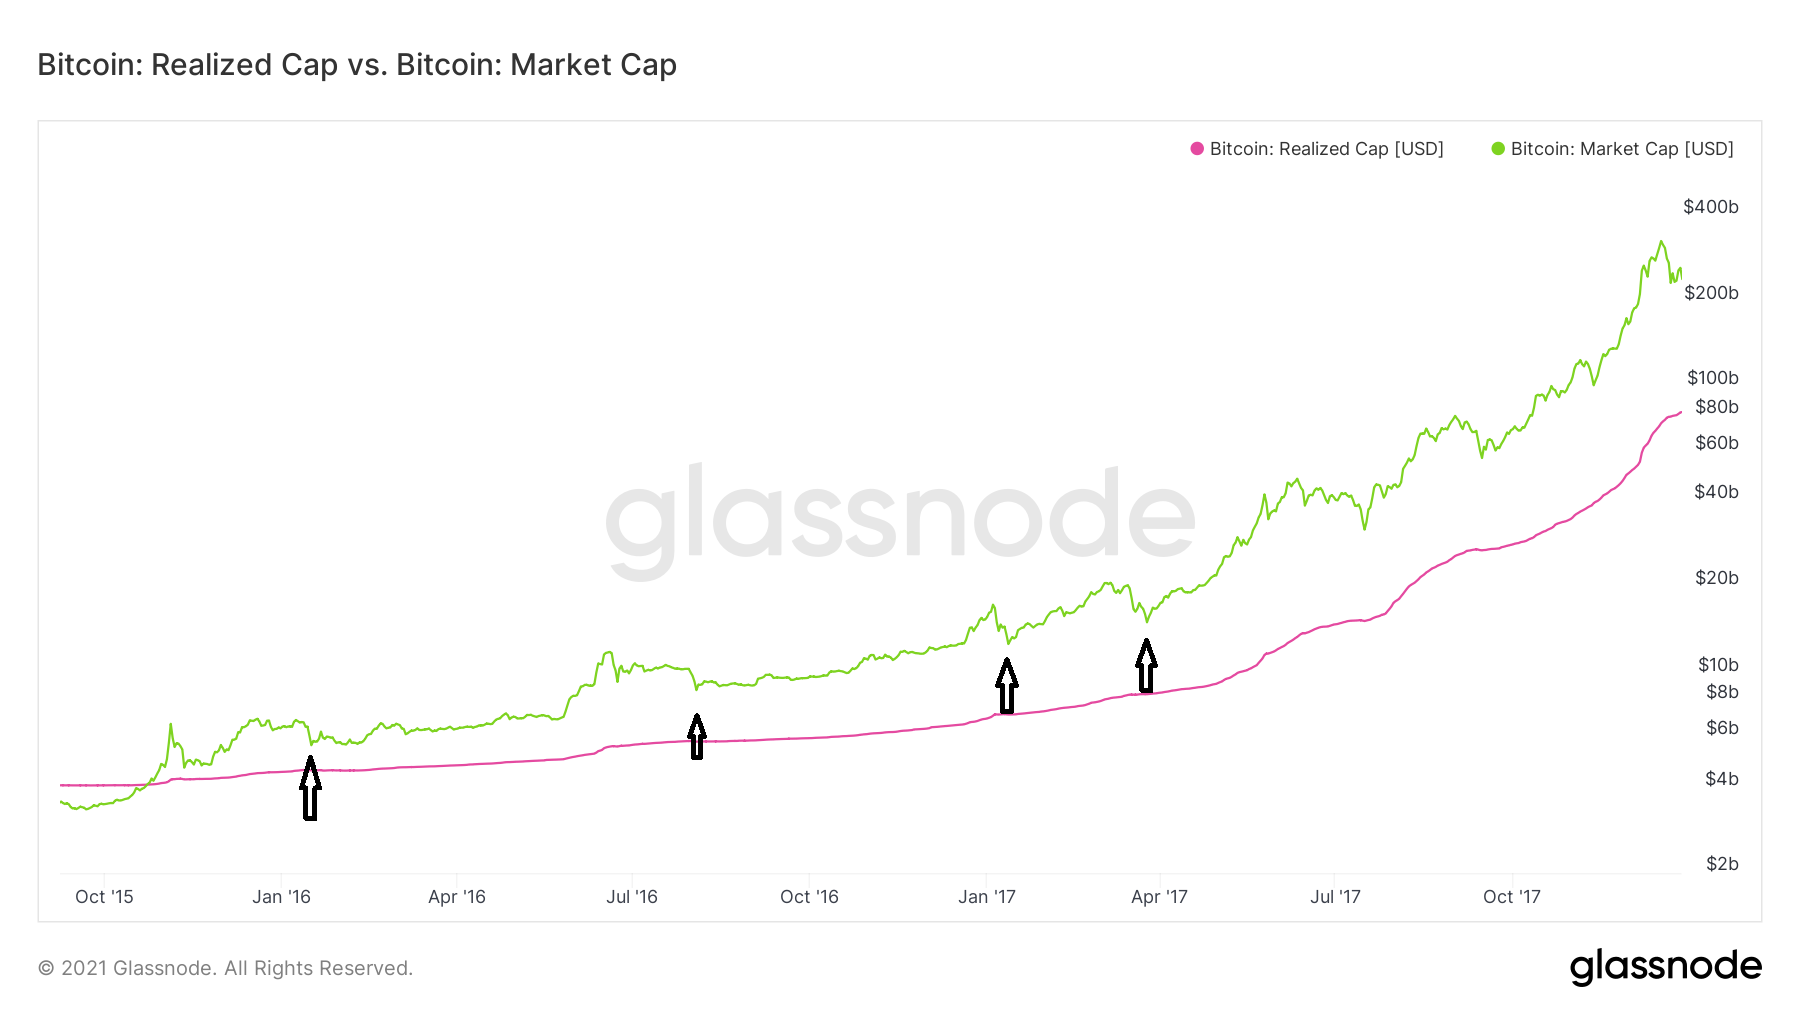 Realized cap/market cap on-chain